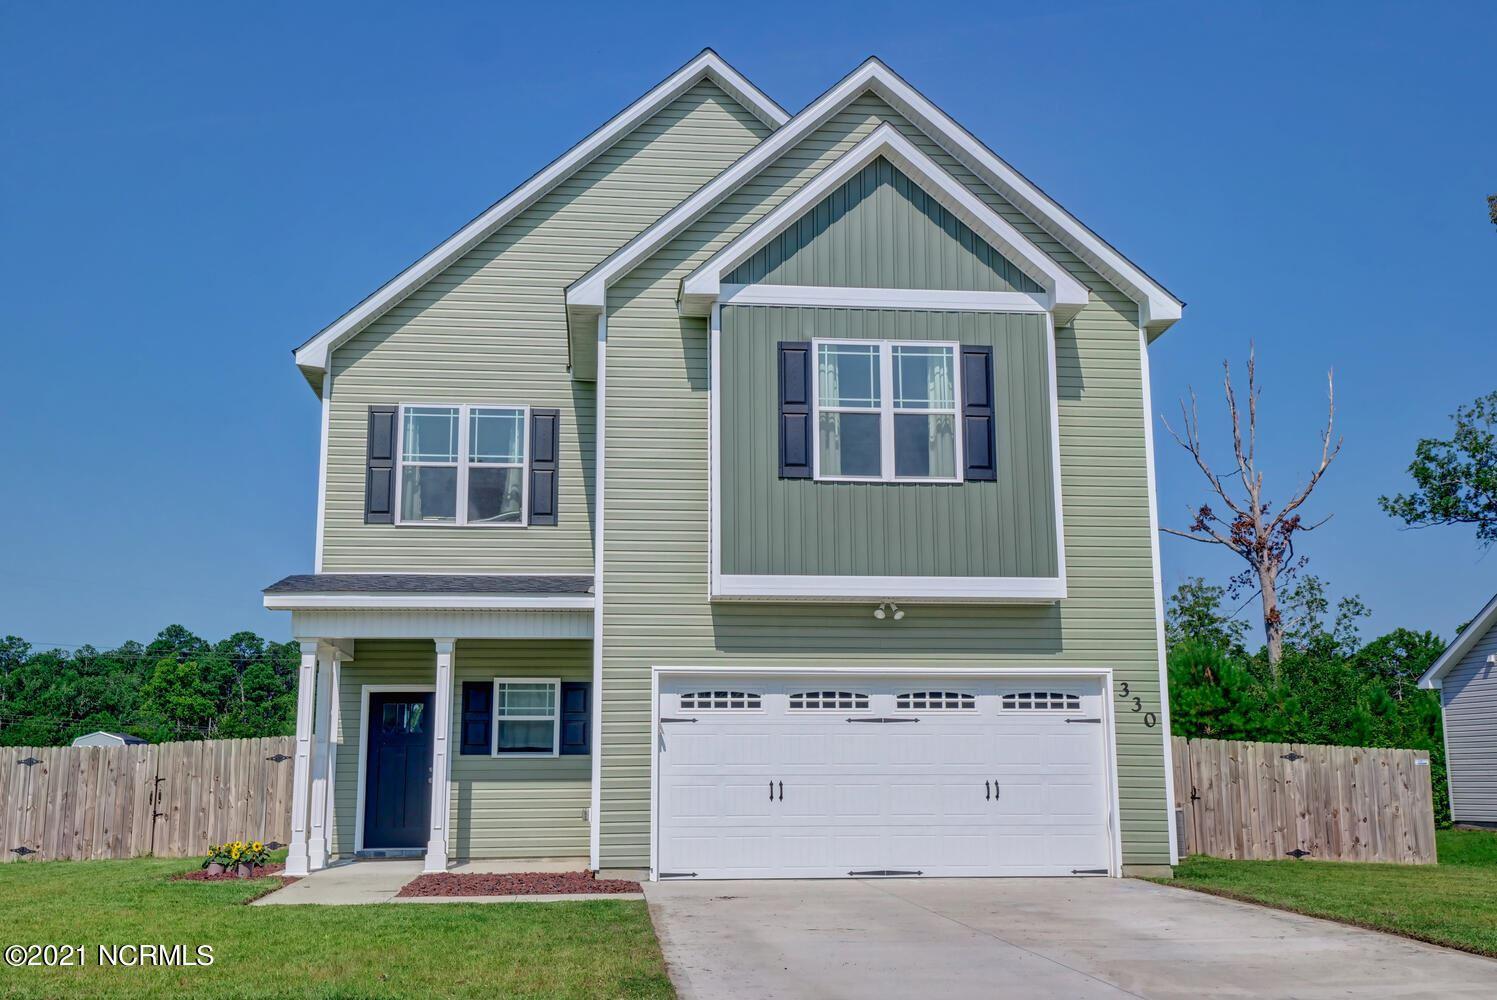 Photo of 330 Adobe Lane, Jacksonville, NC 28546 (MLS # 100286457)